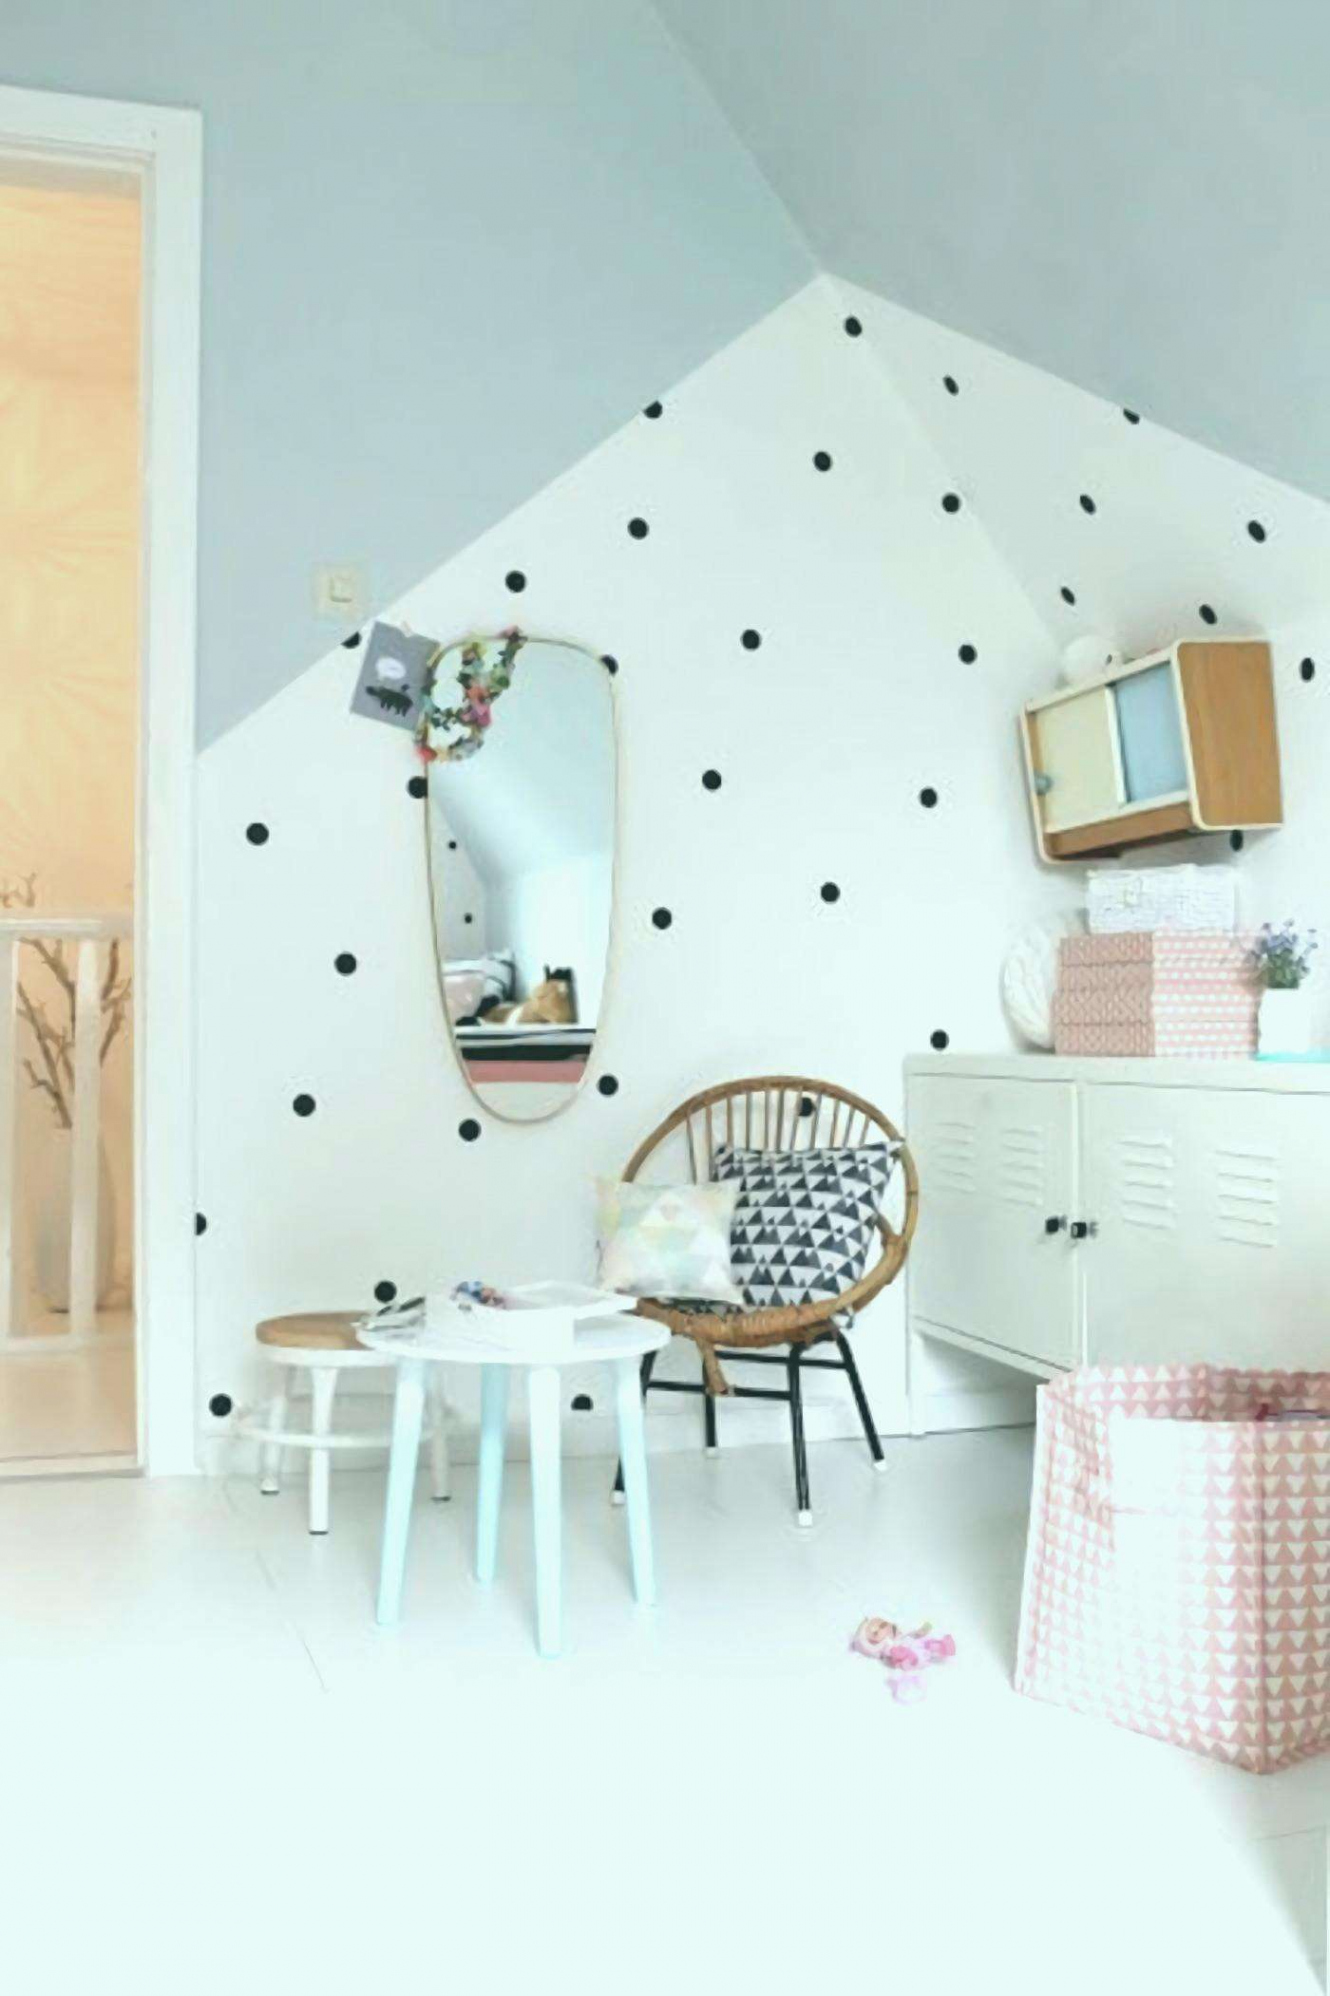 45 luxus deko ideen kuche galerie kuchen fur dachgeschosswohnungen kuchen fur dachgeschosswohnungen 11